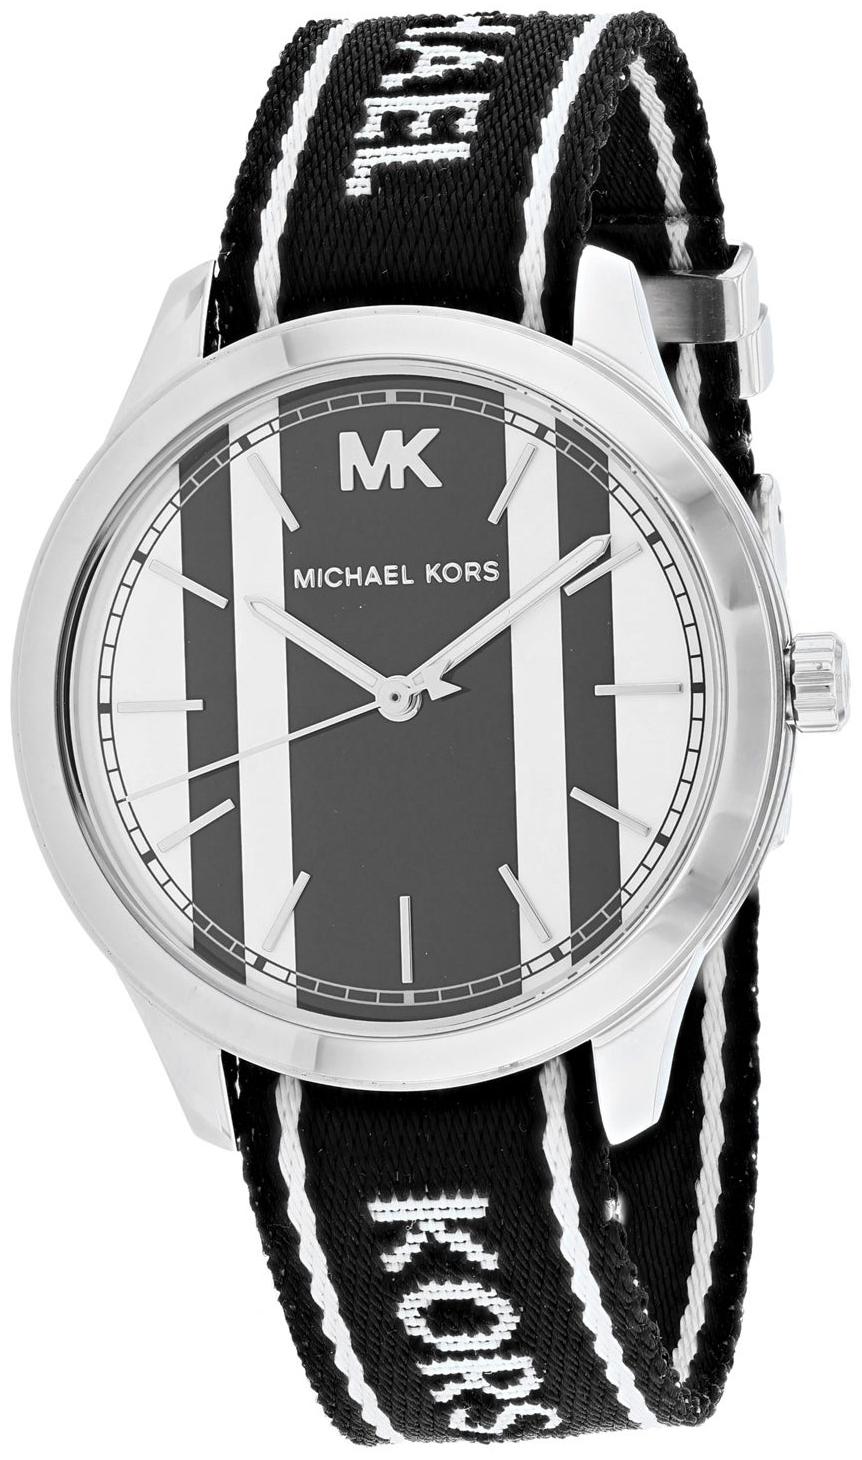 Michael Kors Runway Dameklokke MK2795 Flerfarget/Tekstil Ø38 mm - Michael Kors